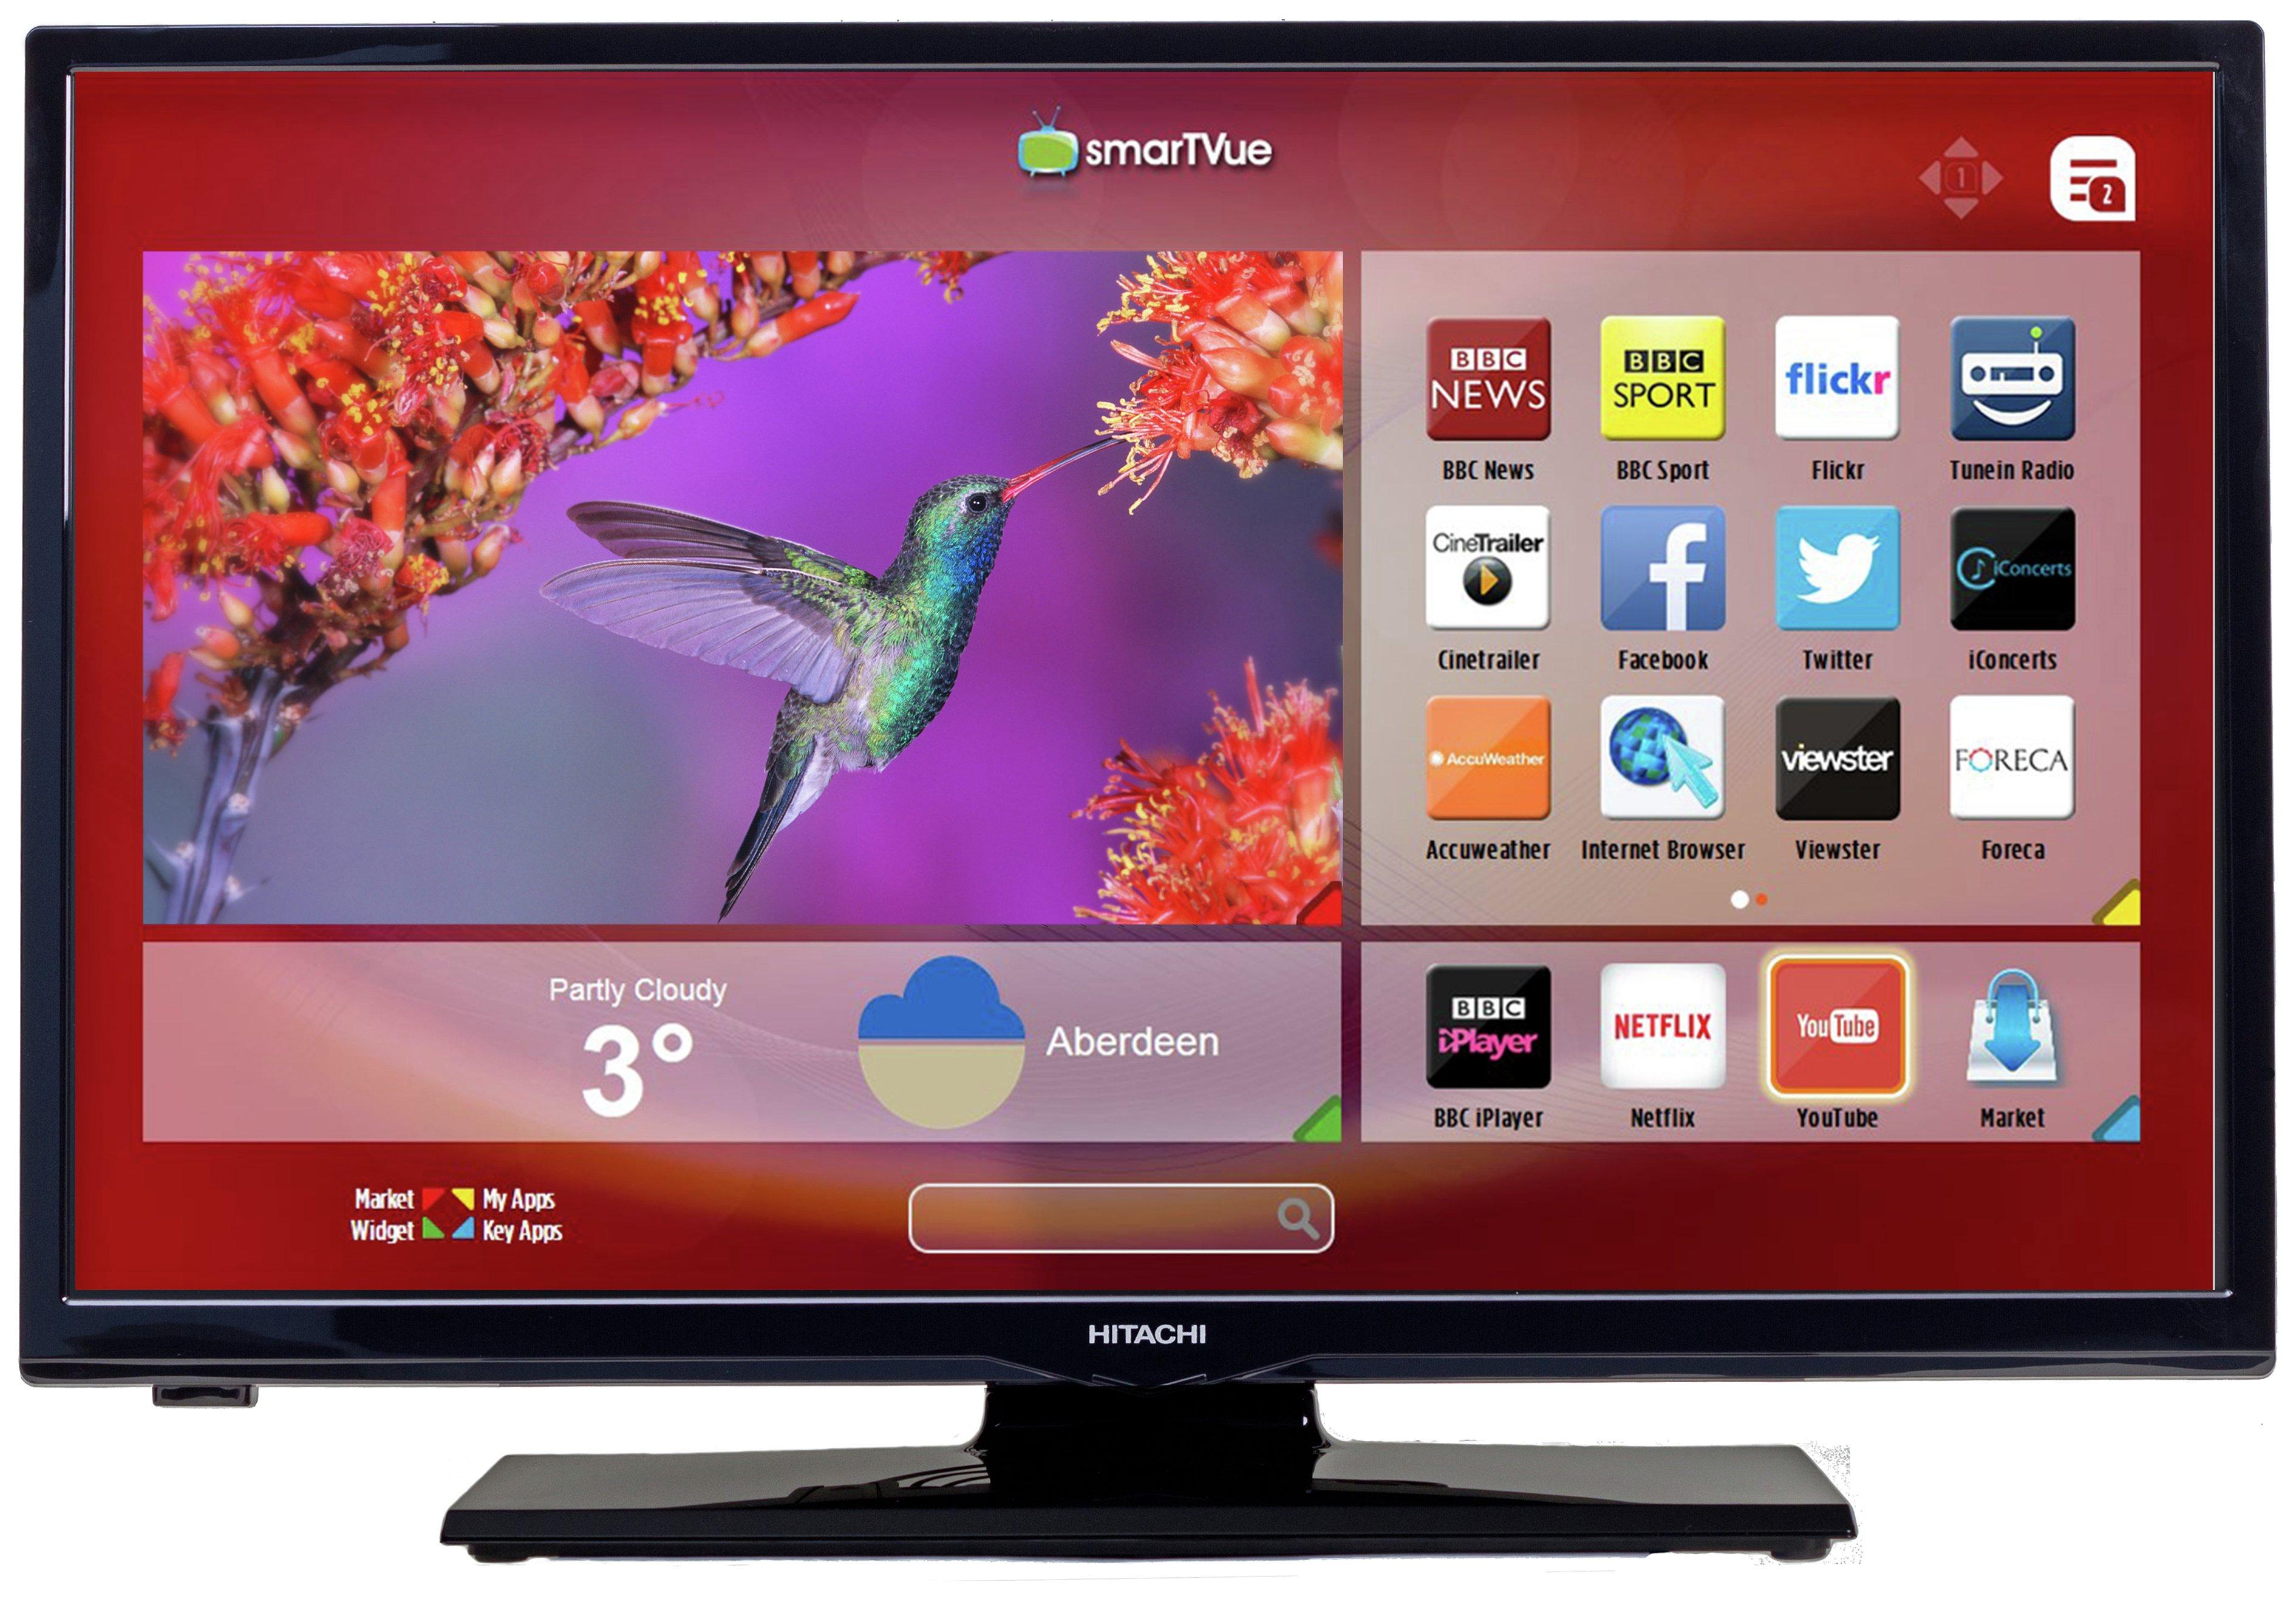 HItachi - 24 Inch - HD Ready Freeview HD - Smart TV.